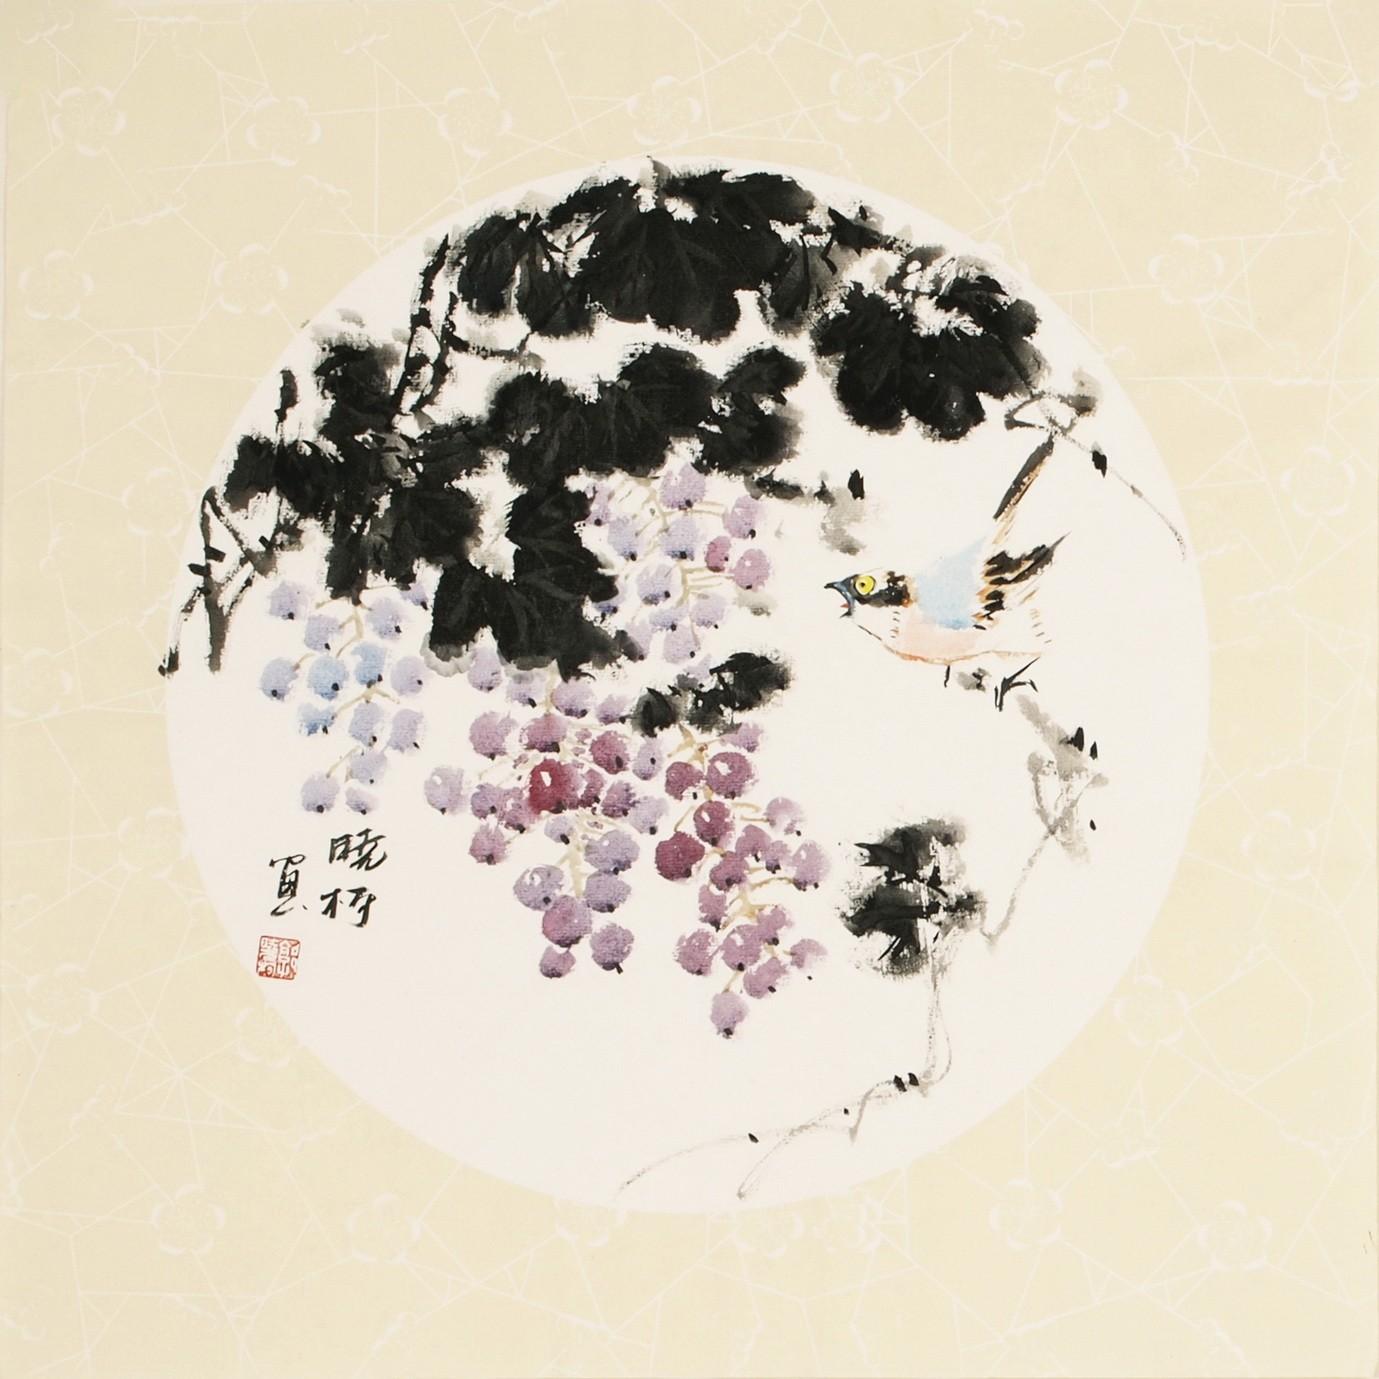 Grapes - CNAG006108